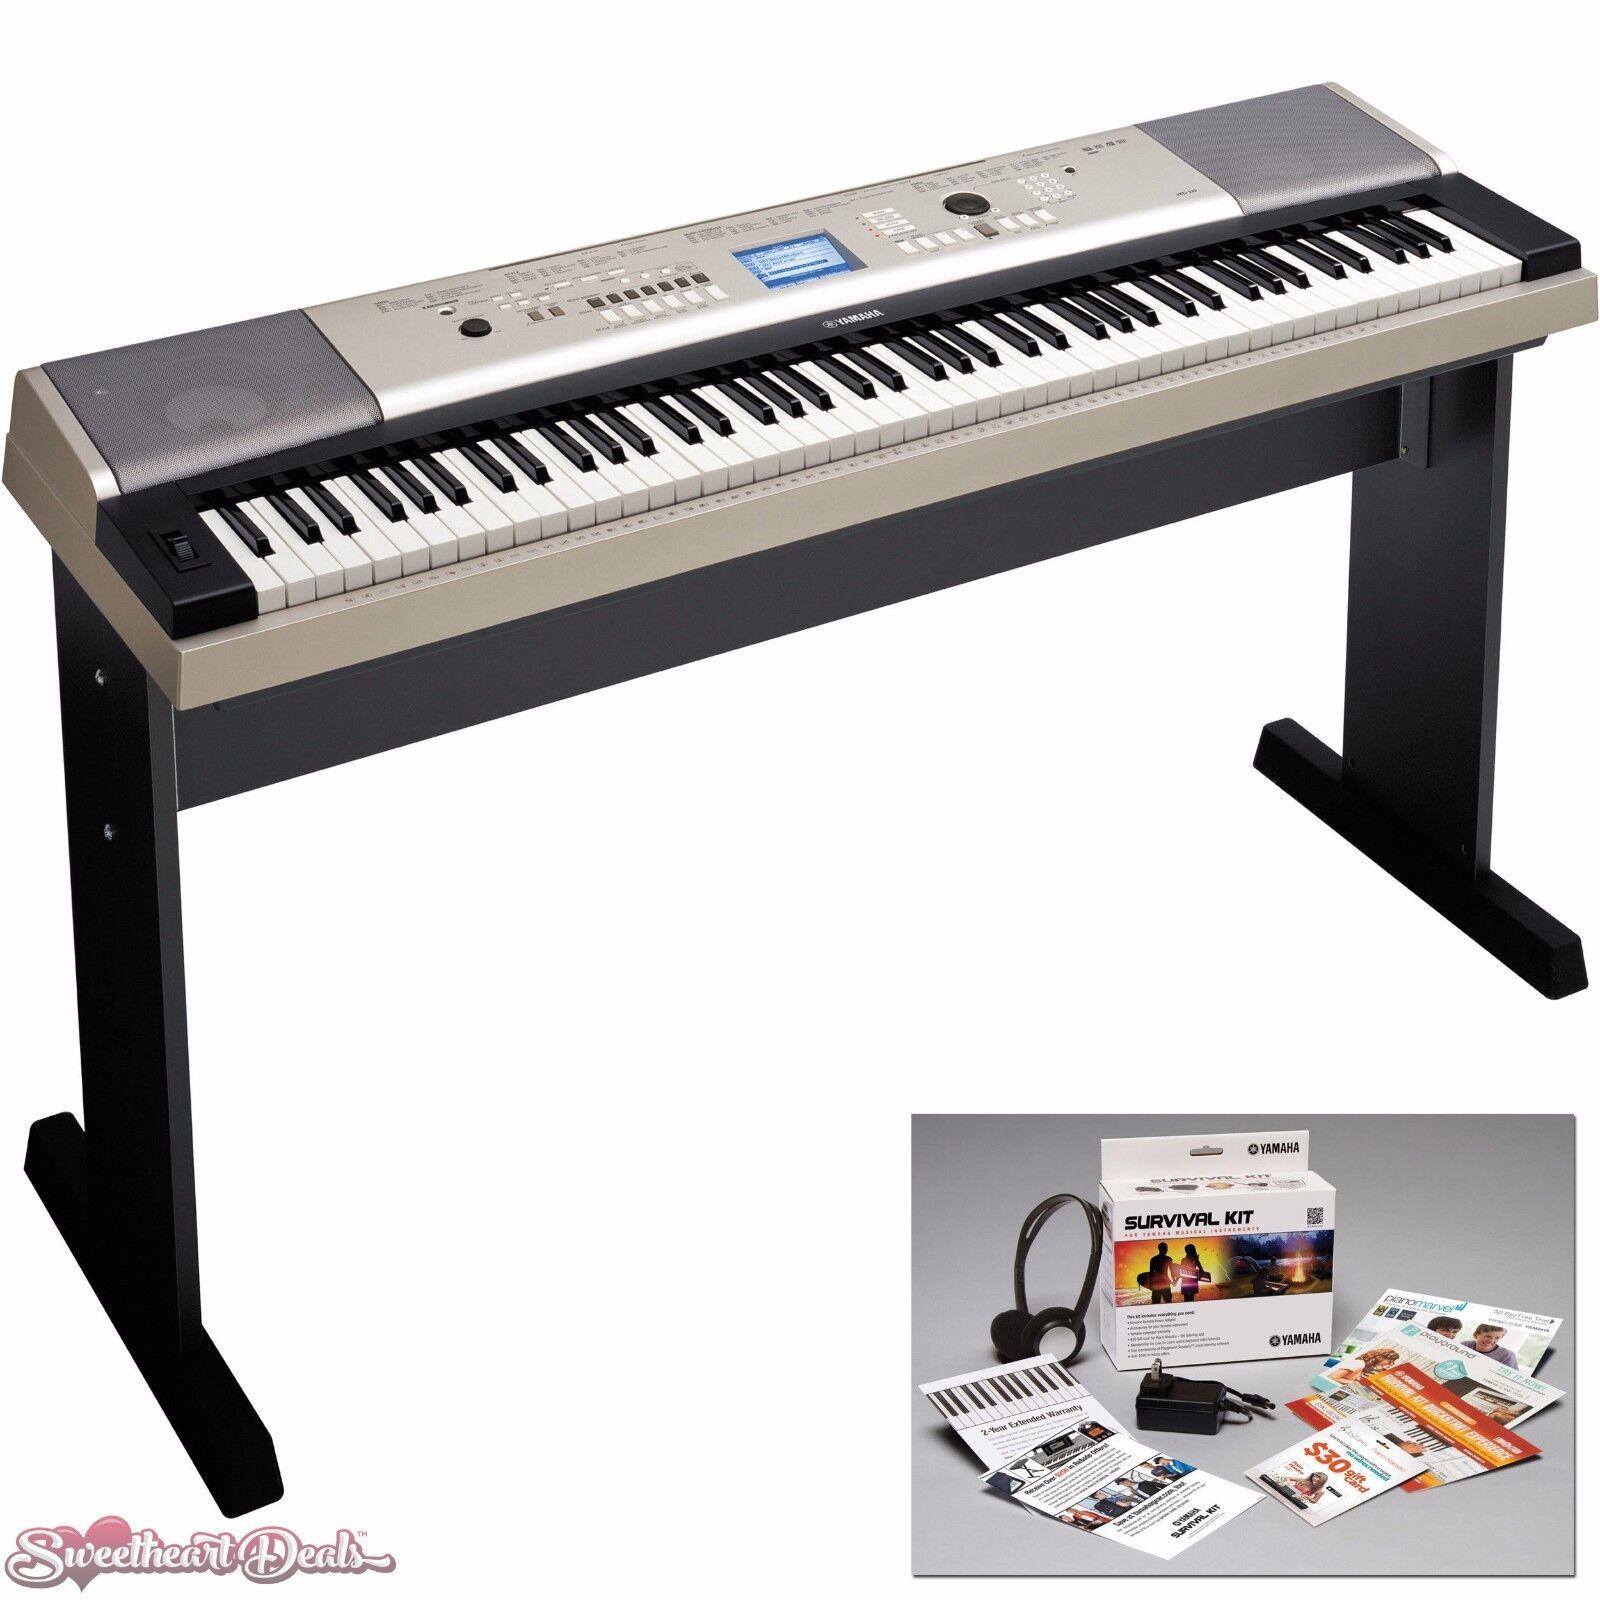 Yamaha YPG-535 88 Key Portable Grand Keyboard + Bonus Access